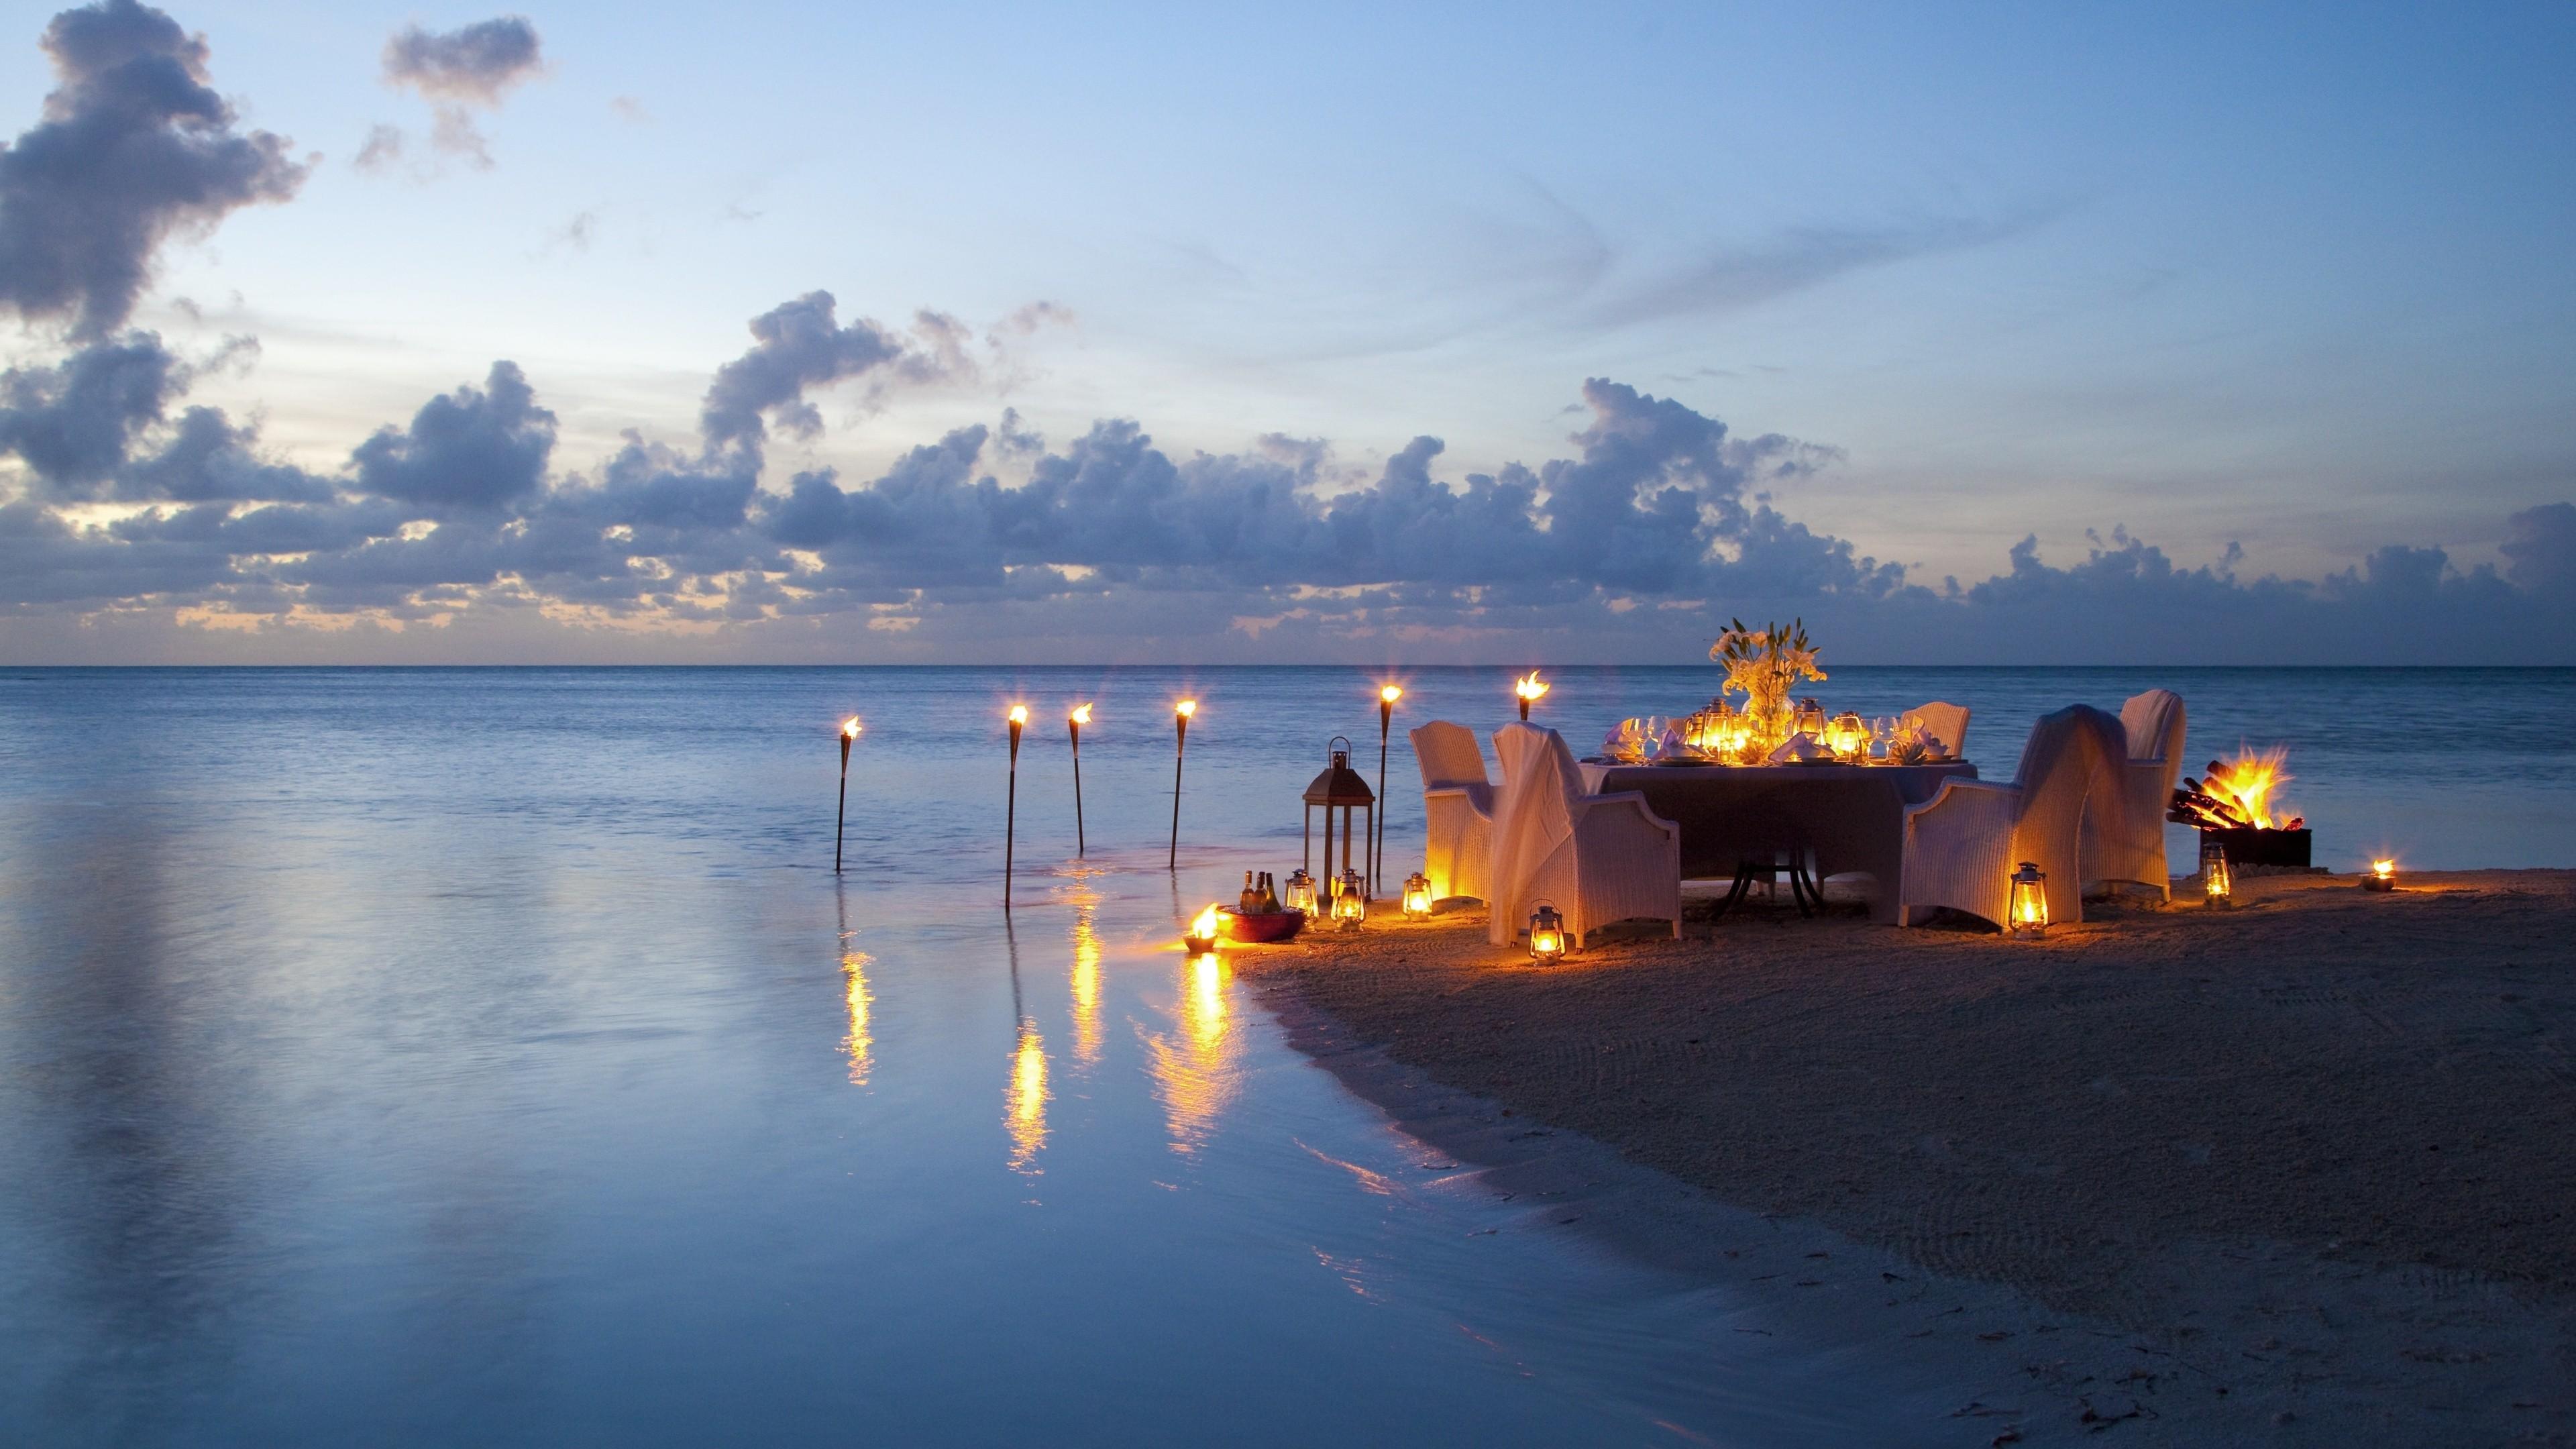 Romantic Candle Light Dinner At Beach